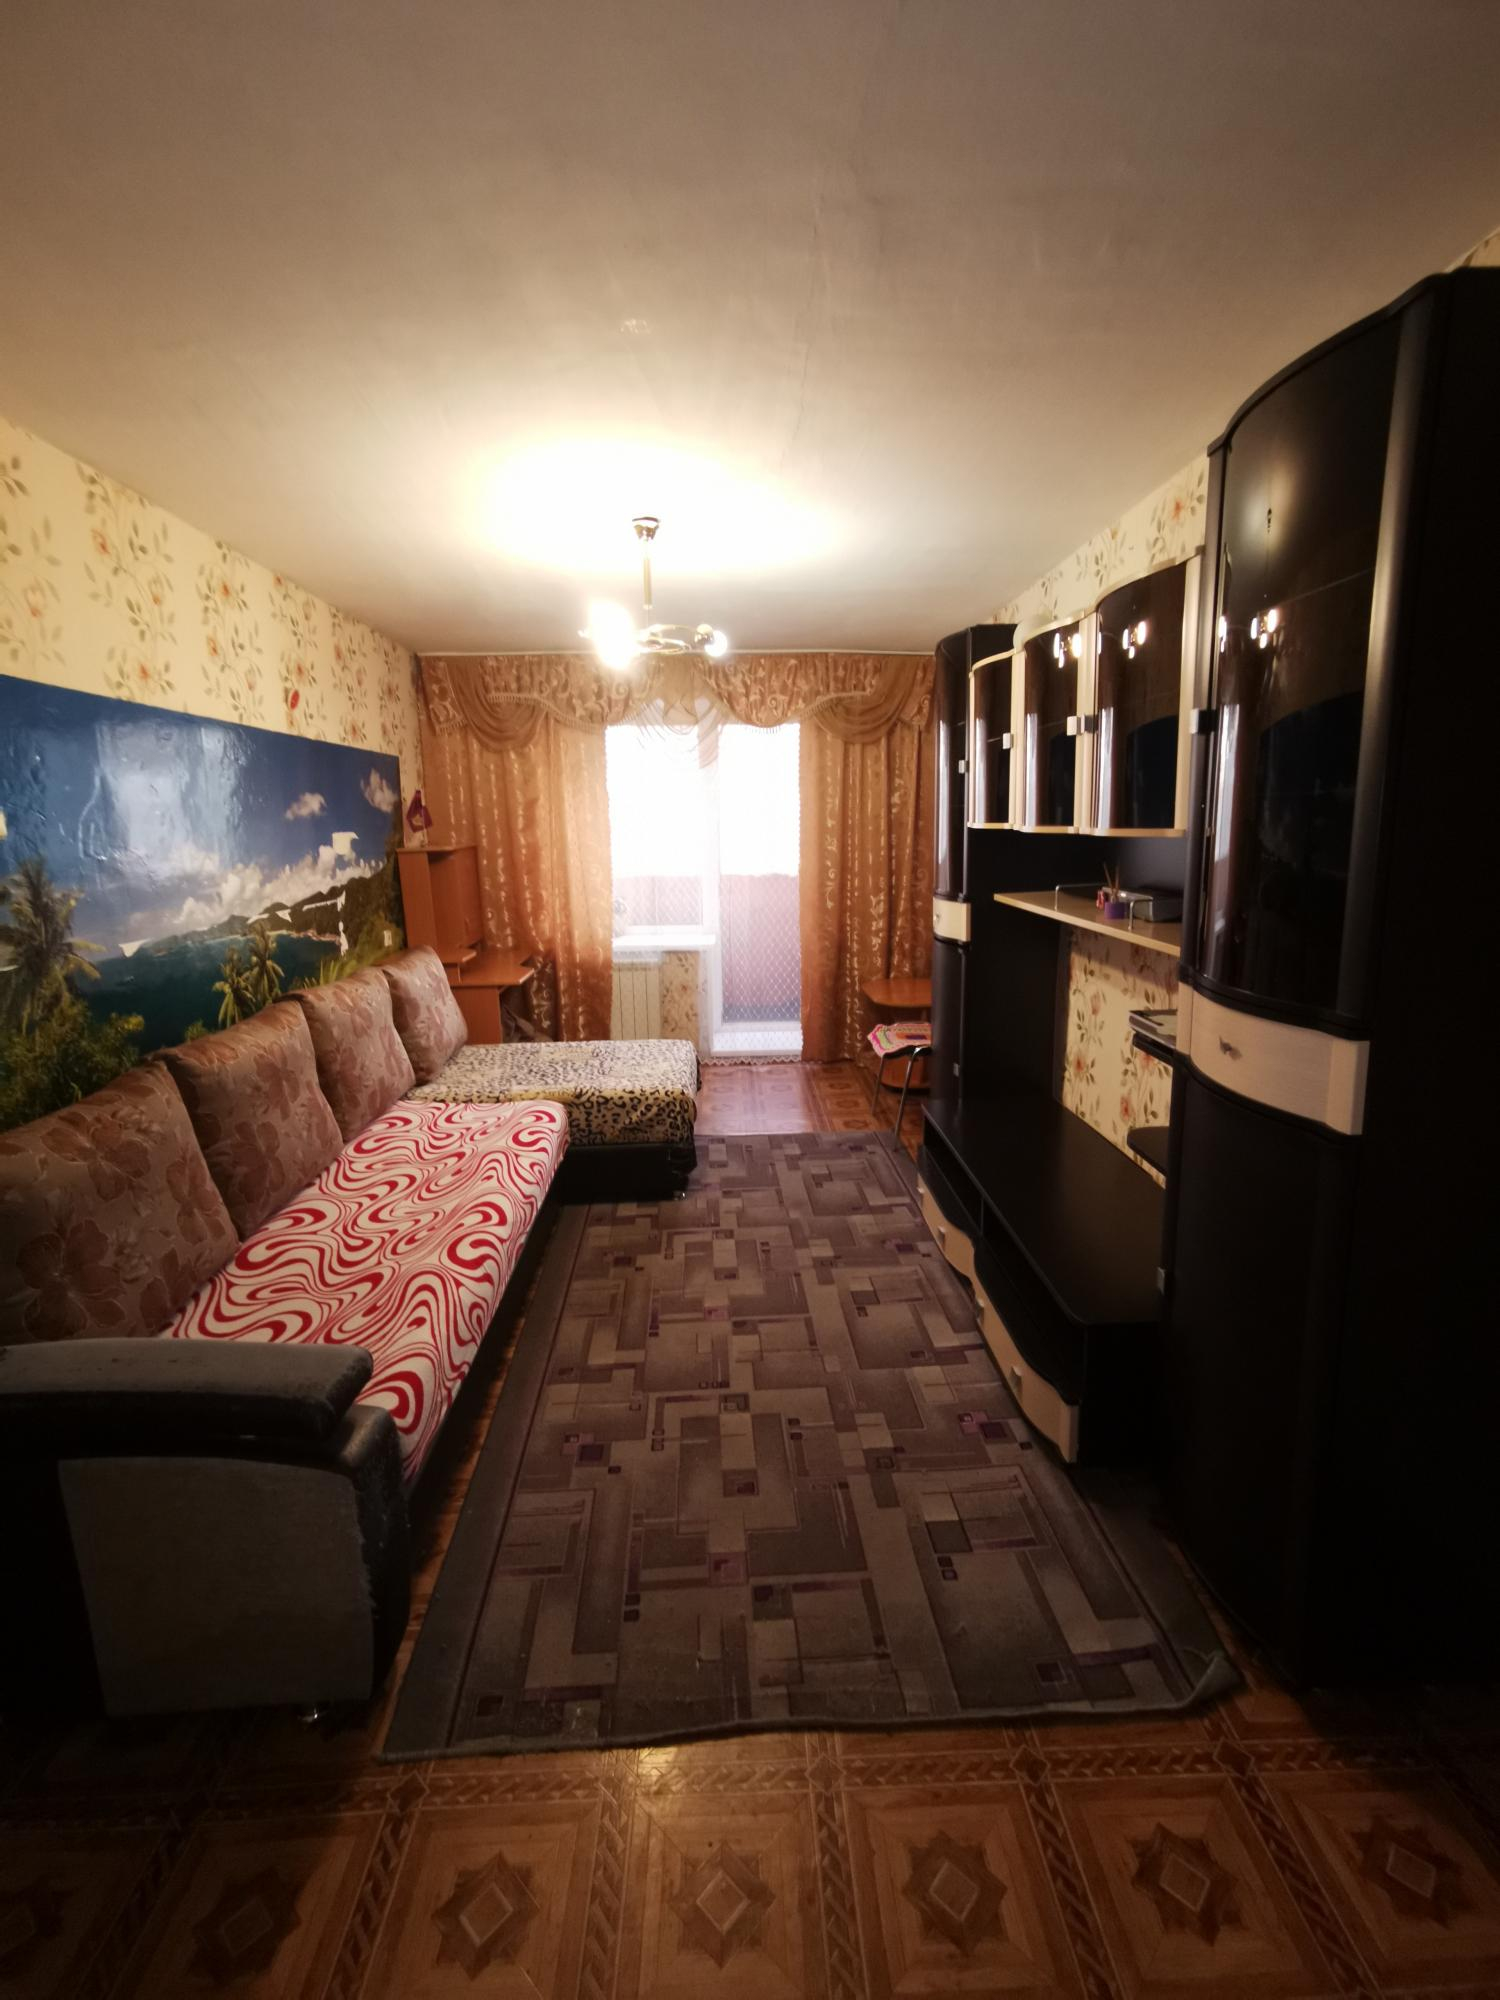 3к квартира Транзитная улица, 34, Россия | 18000 | аренда в Красноярске фото 2